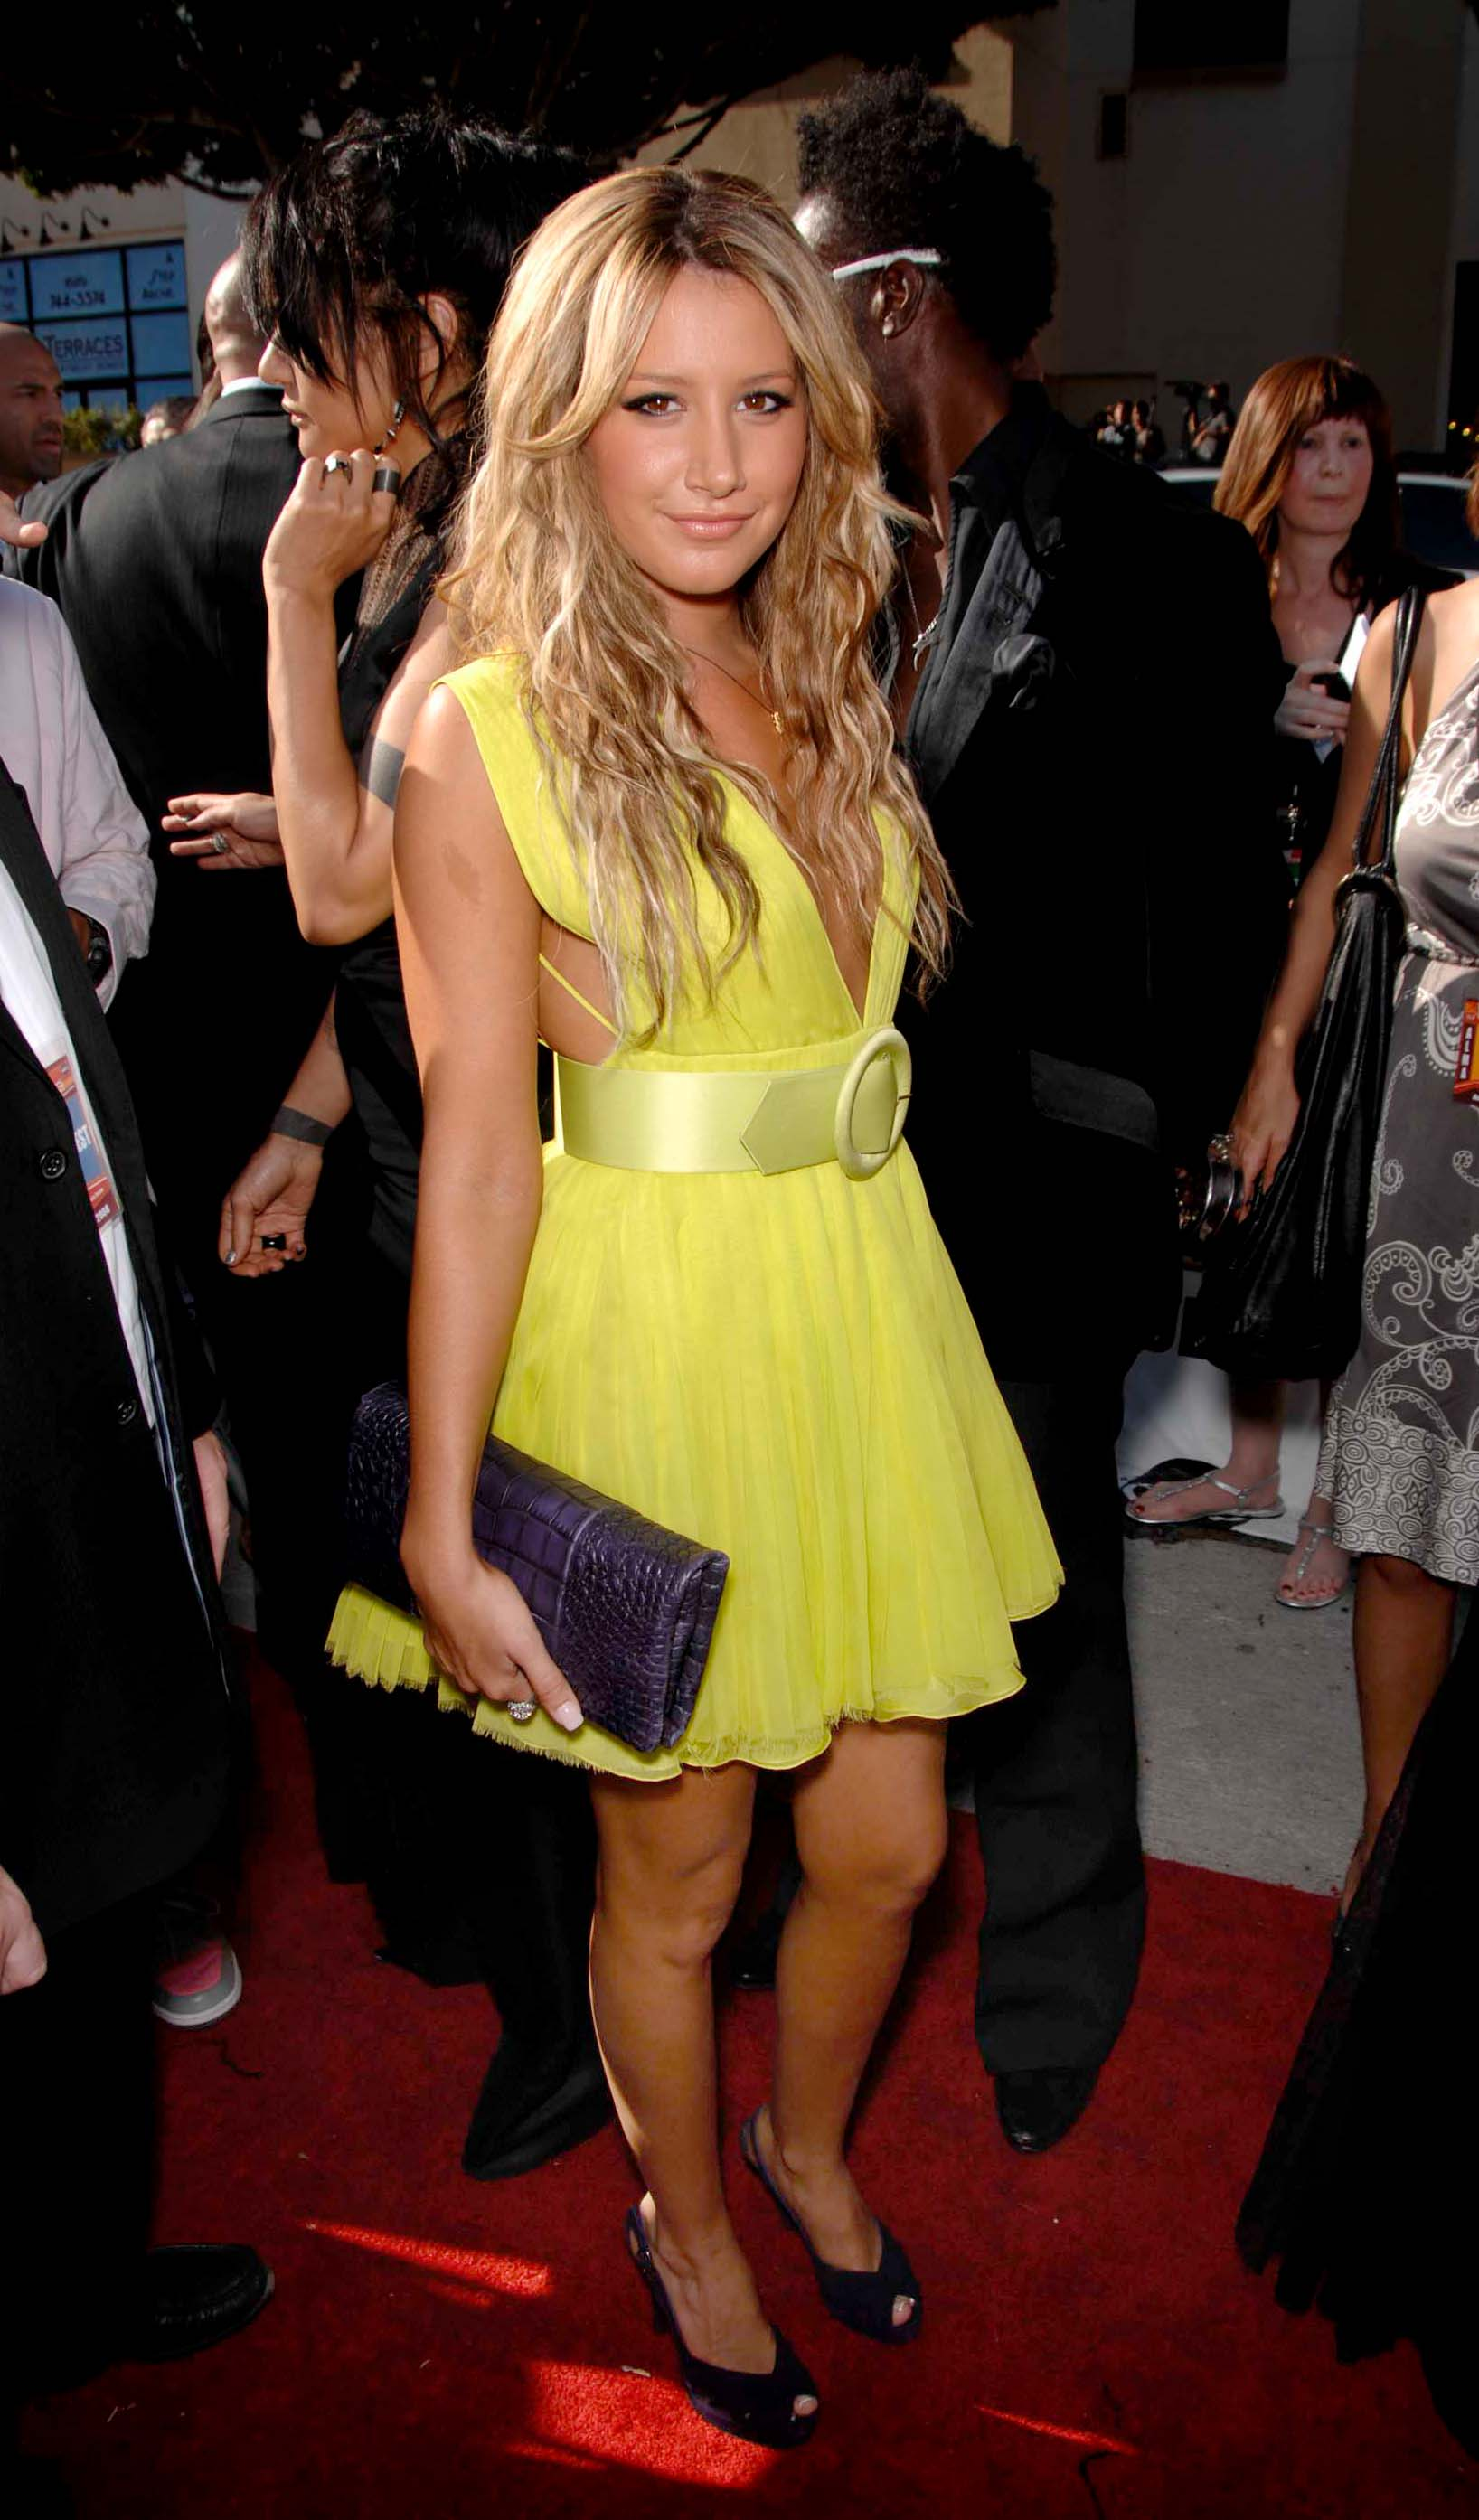 76959_babayaga_Ashley_Tisdale_ALMA_Awards_08-17-2008_94_123_789lo.jpg